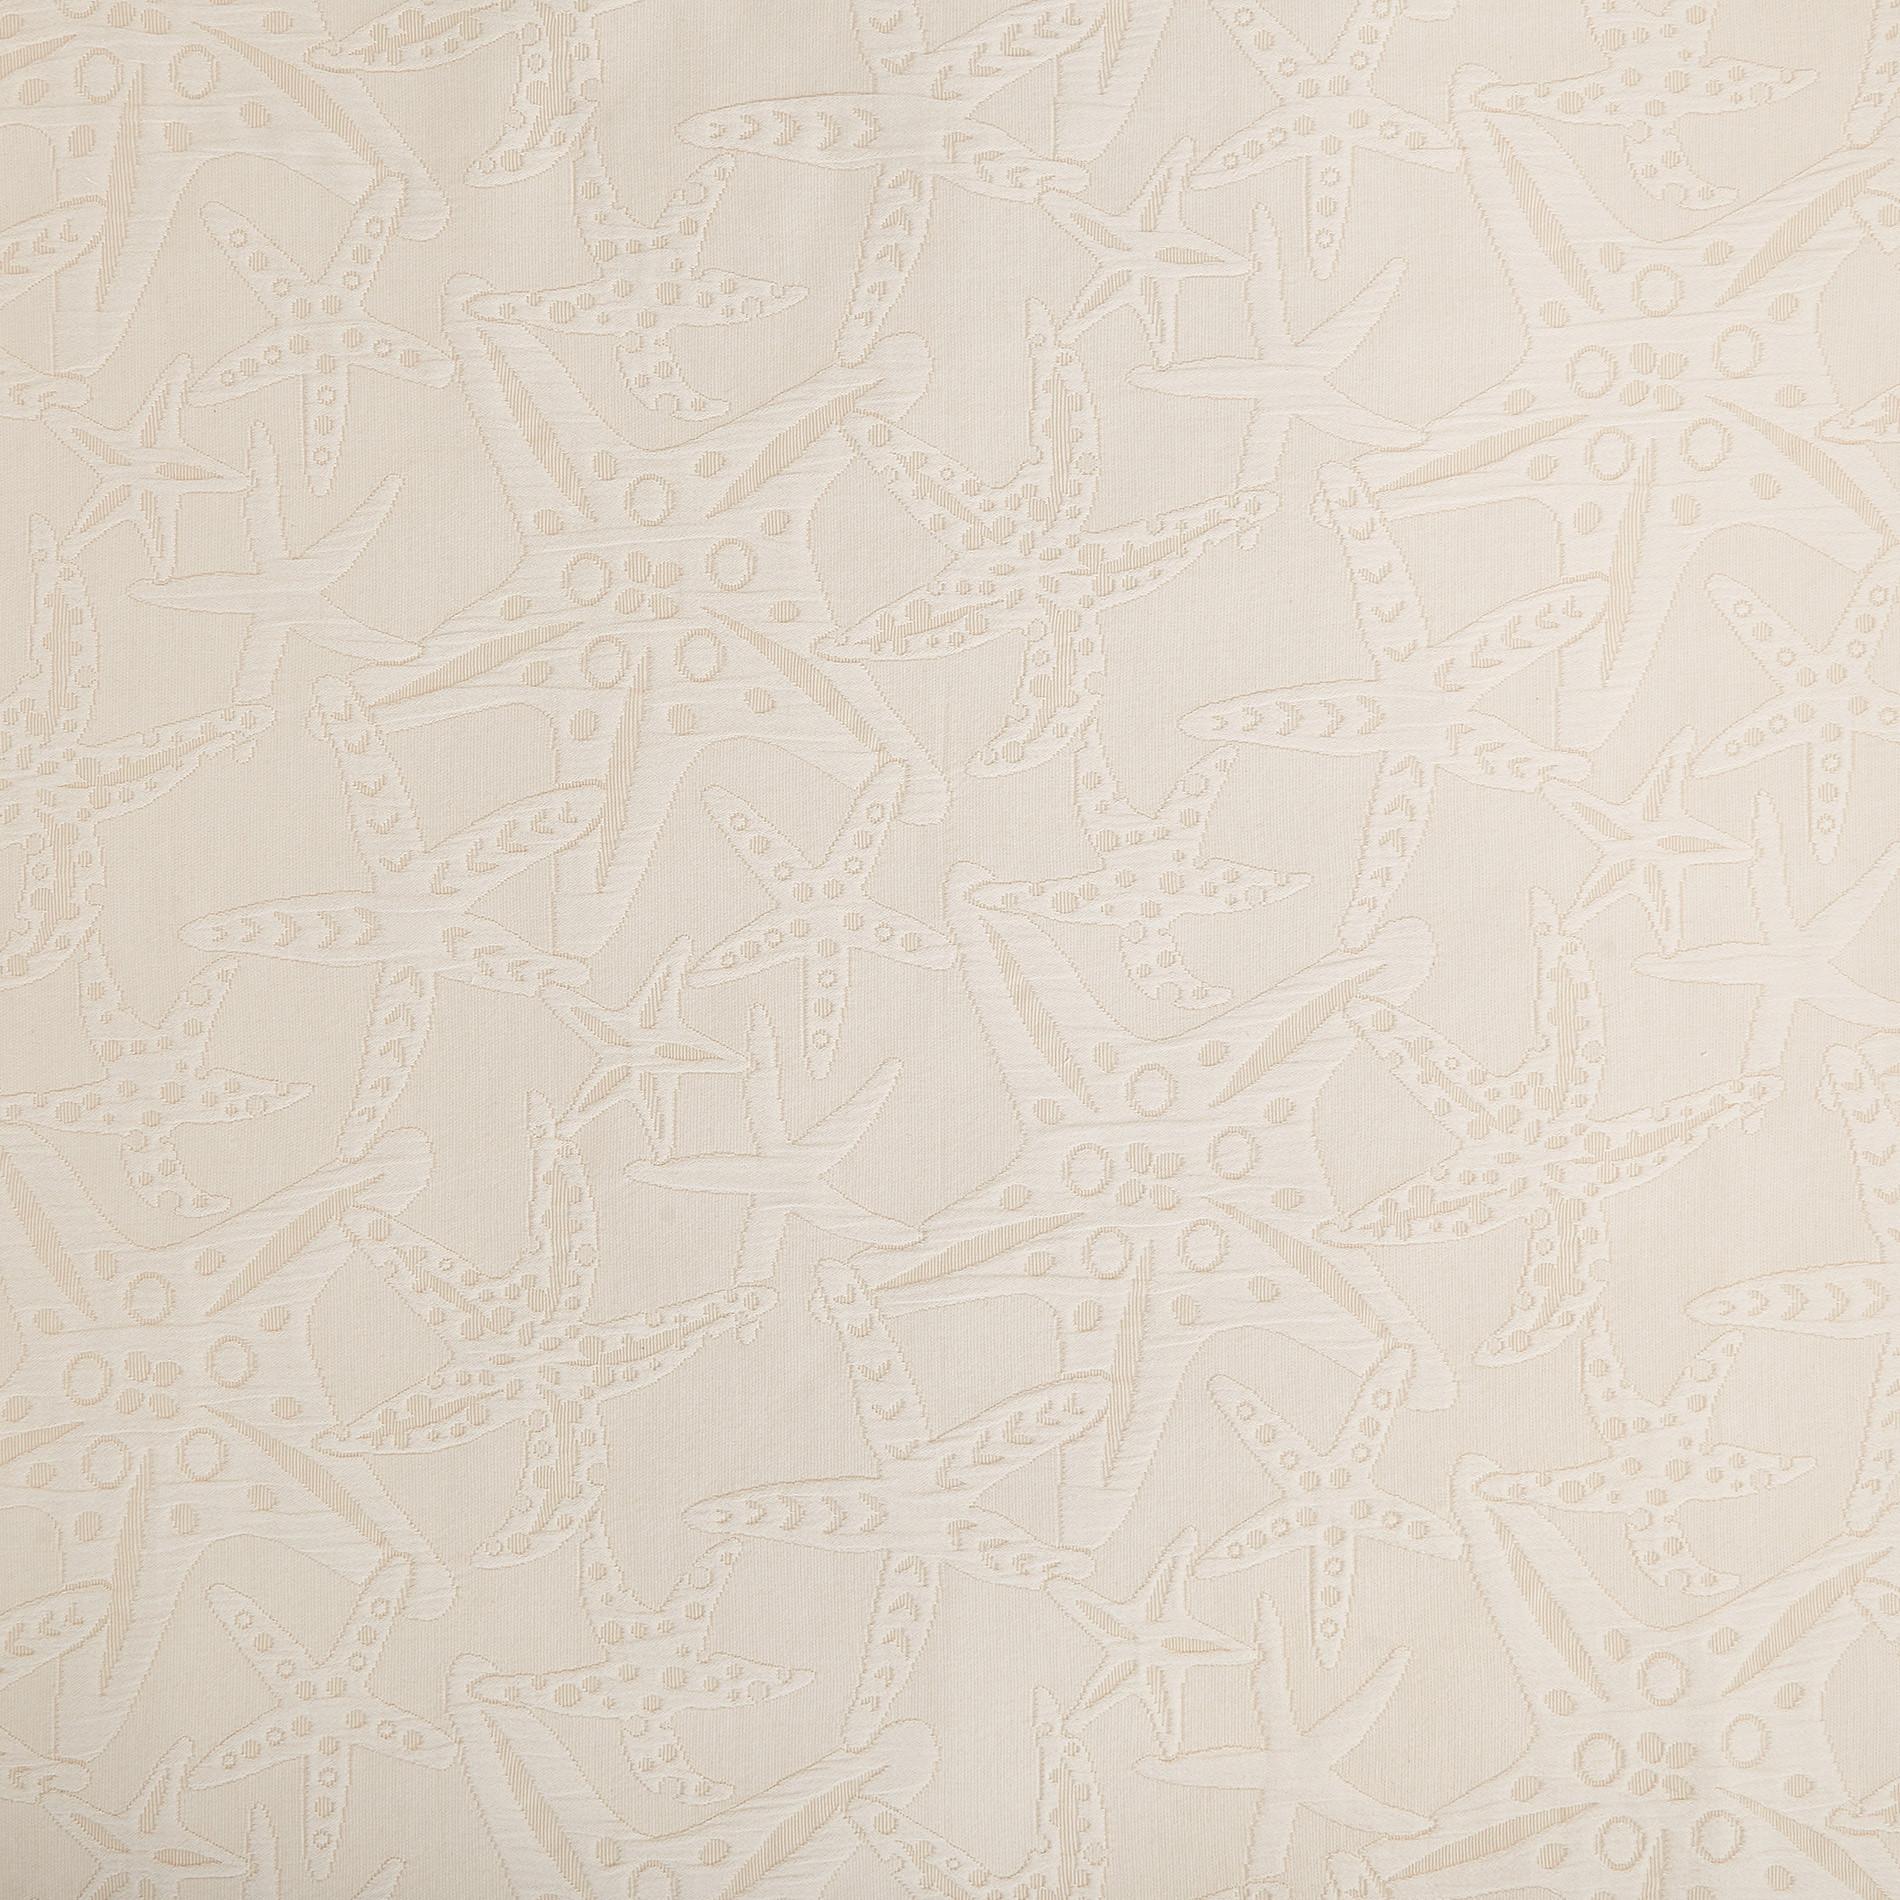 Copriletto puro cotone fantasia stelle marine, Beige, large image number 1